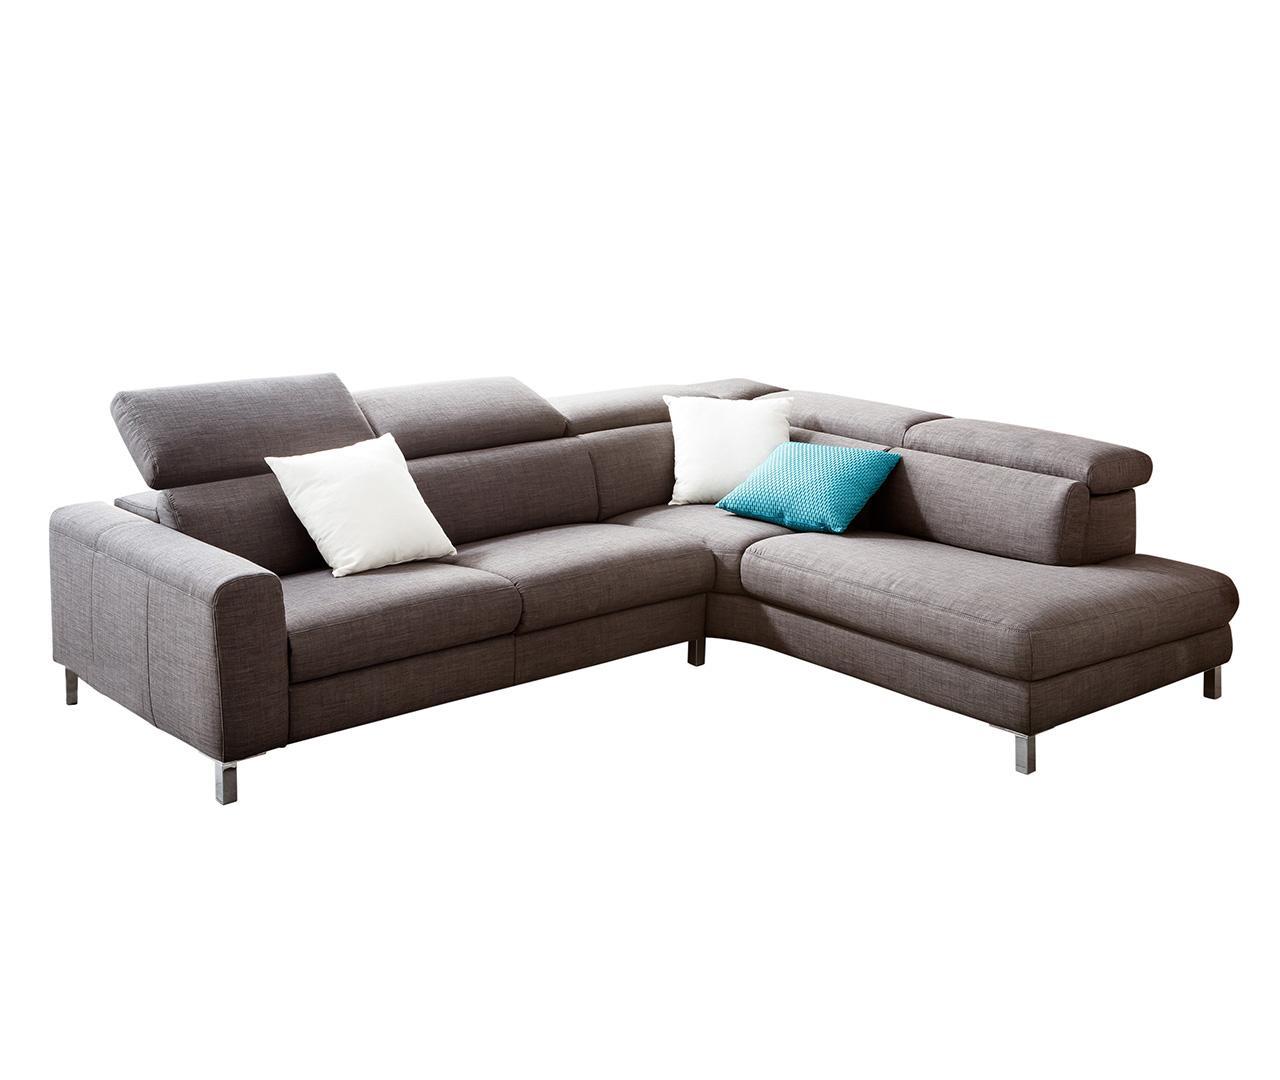 Joop Sofa 8153